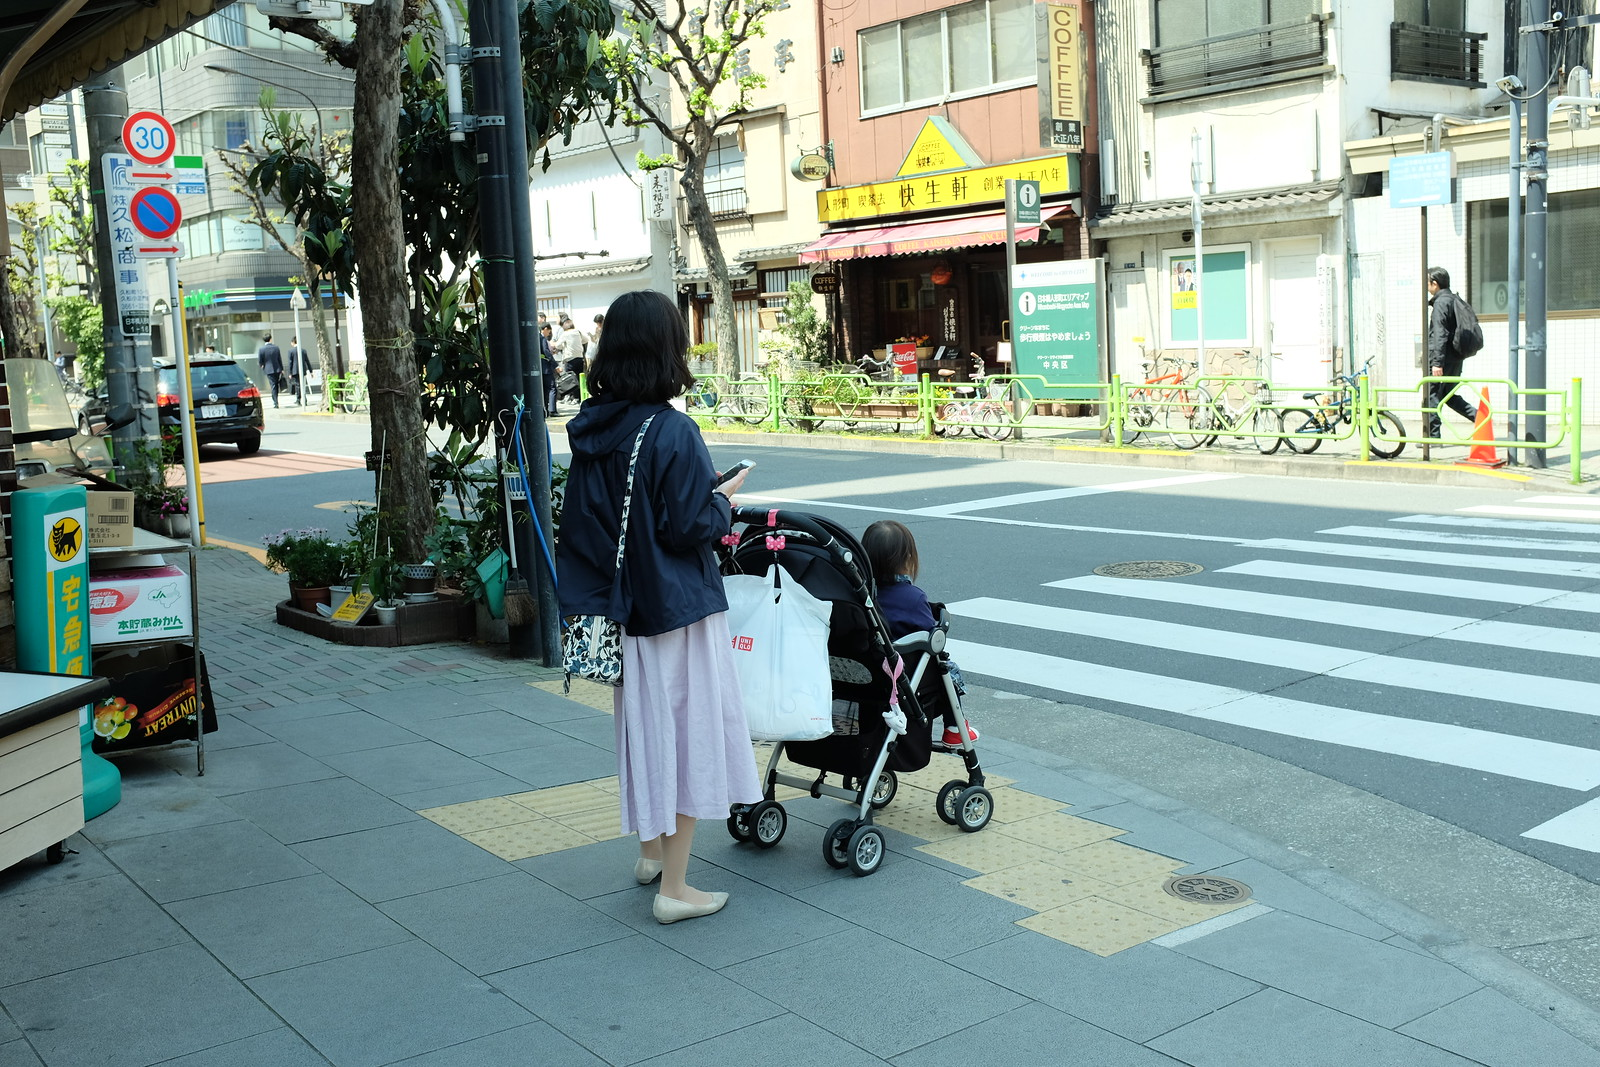 The Ningyocho Tokyo taken by FUJIFILM X100S.